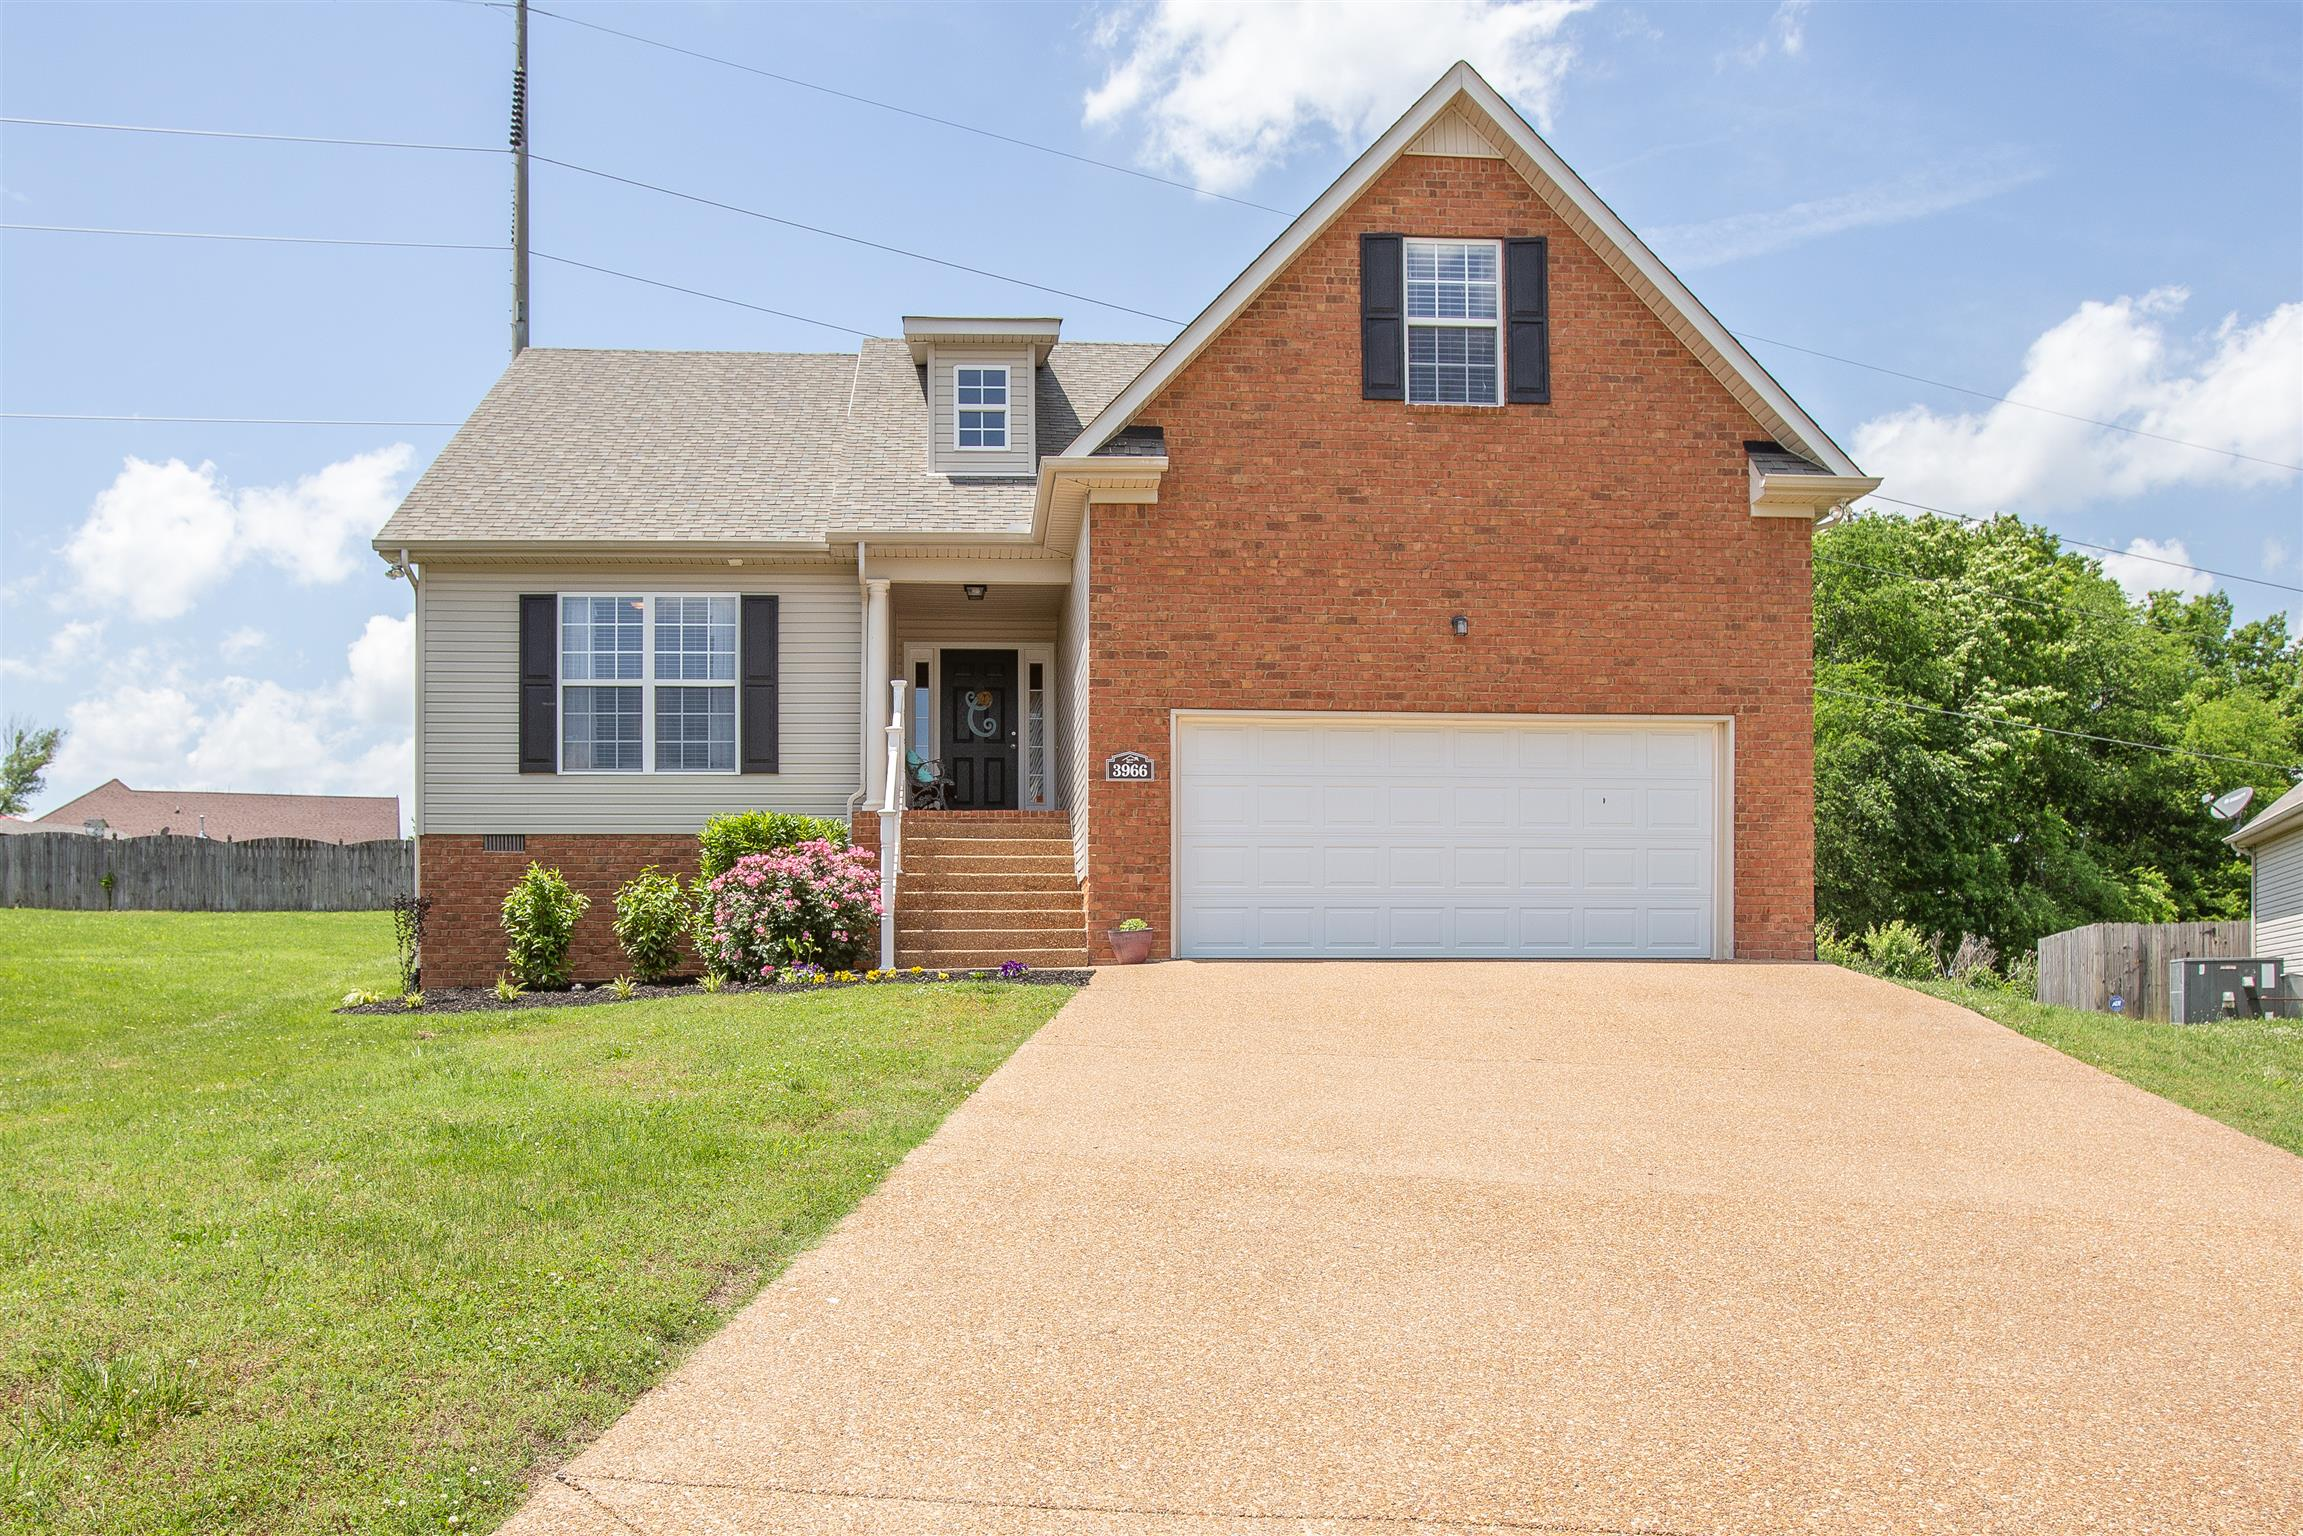 3966 Kristen St, Spring Hill, Tennessee